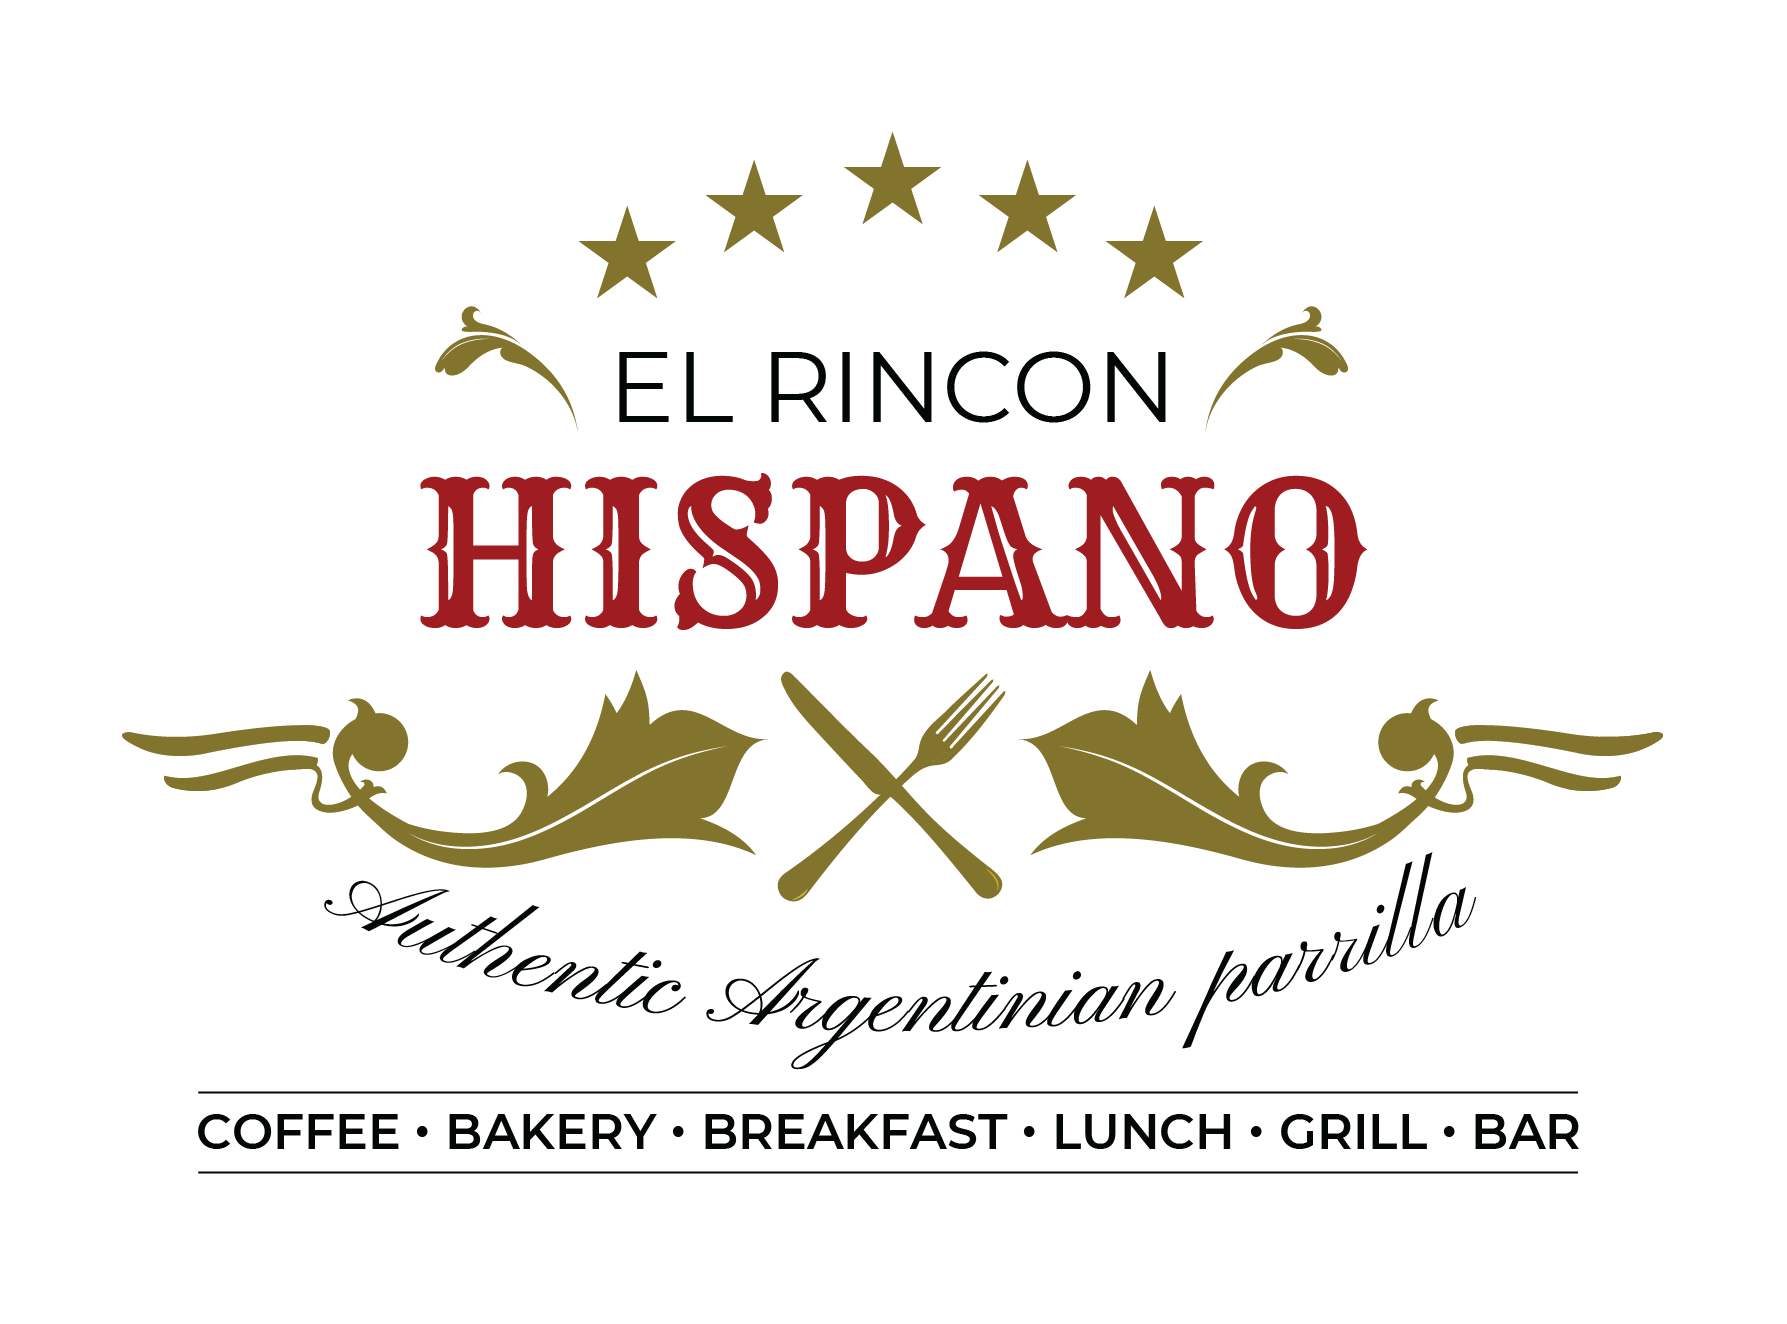 El Rincon Hispano